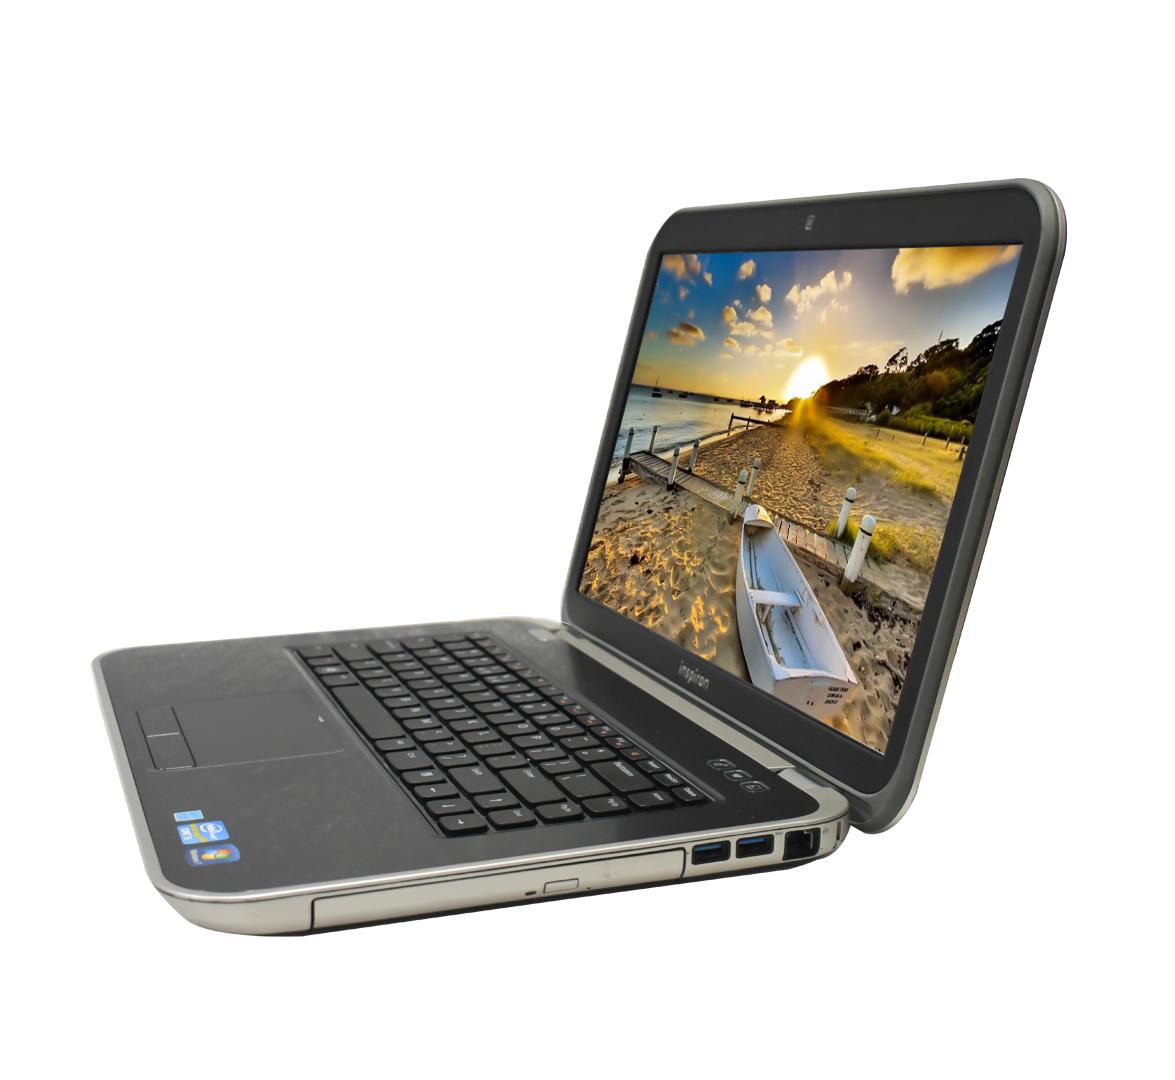 Dell Inspiron 5520 Business Laptop, Intel Core i5-3210M CPU, 4GB DDR3 SODIMM RAM, 500GB SATA 2.5 Hard, 15 inch Display, Windows 10 Pro (Refurbished)